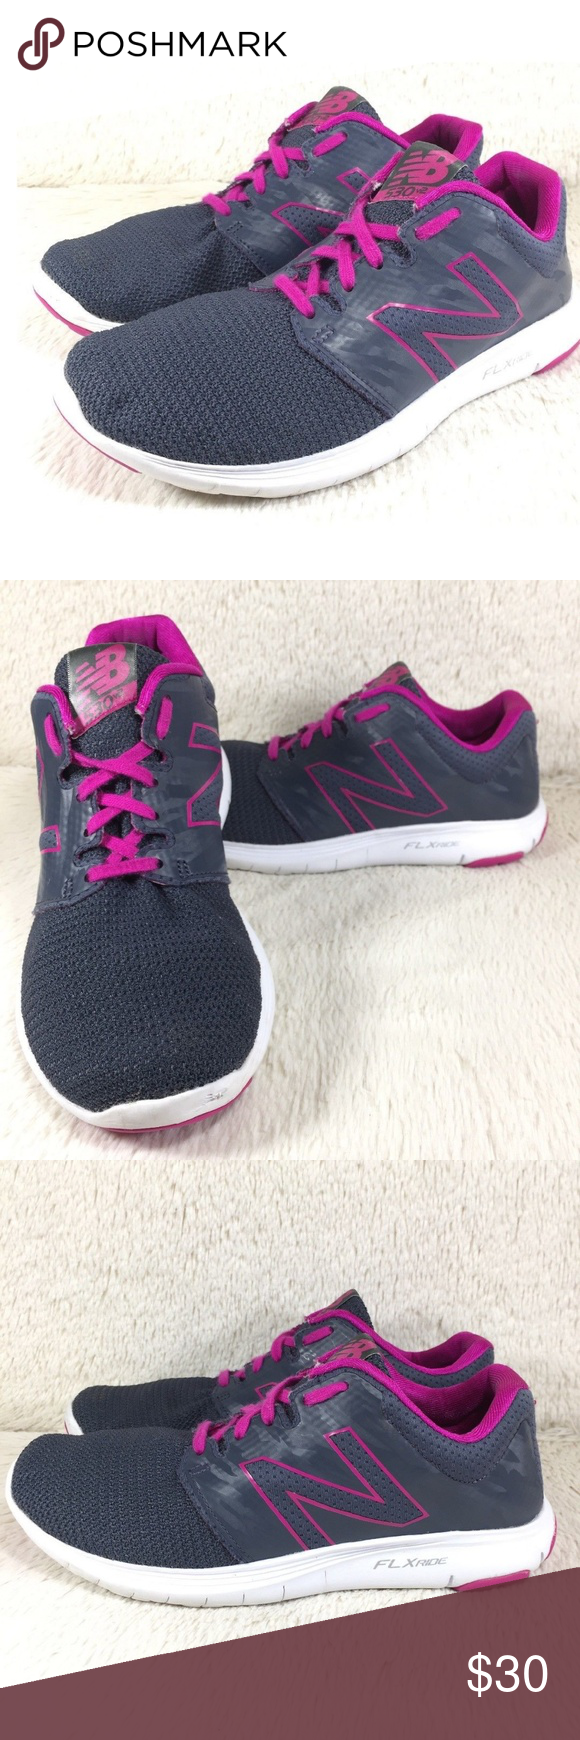 sale retailer ed620 5e404 New Balance Shoes 530 v2 Womens Sneakers Size 7 New Balance ...